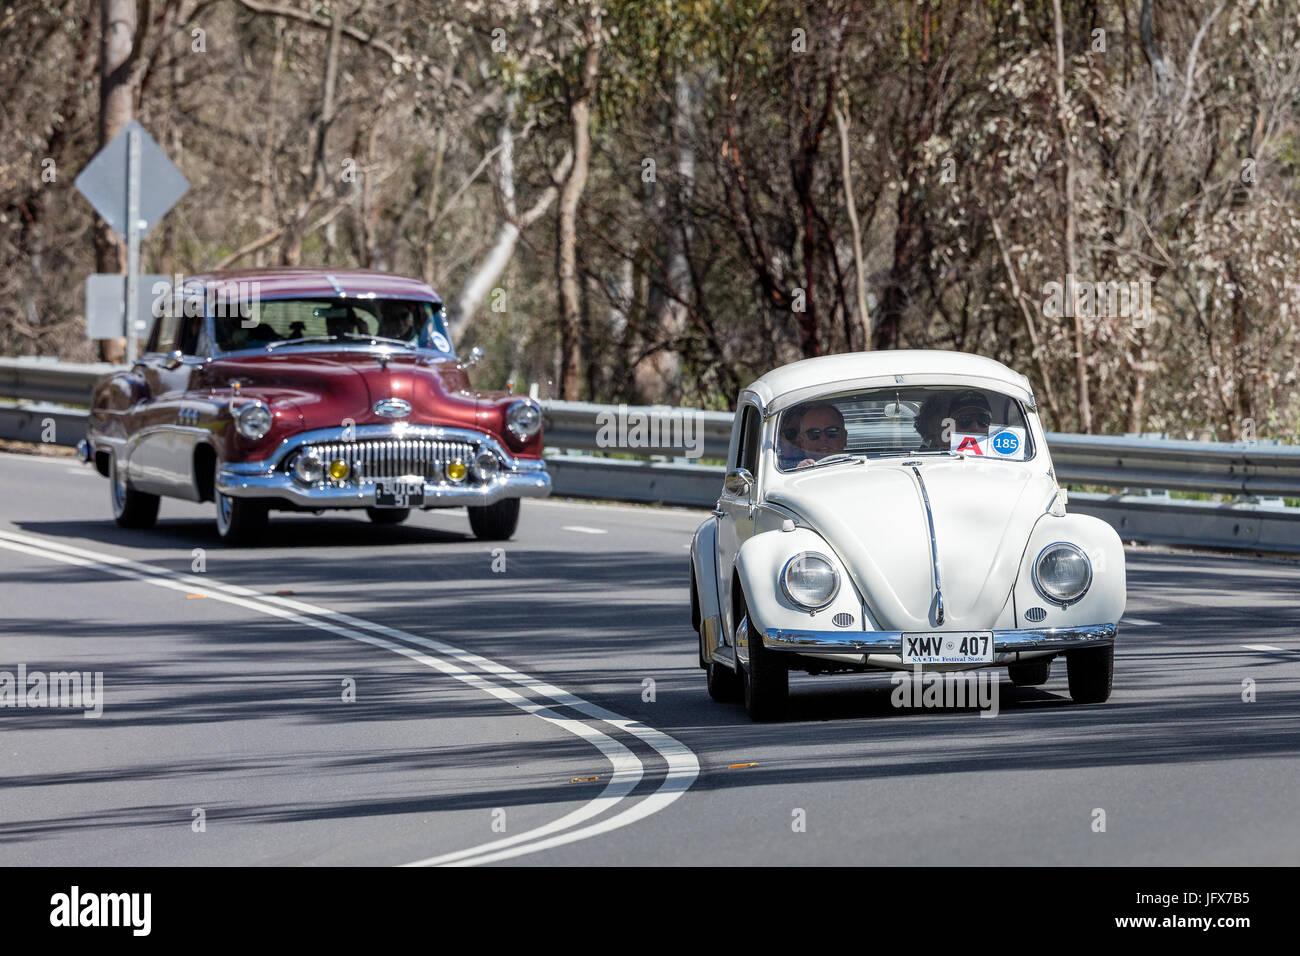 Vintage 1959 Volkswagen Type 1 Sedan driving on country roads near the town of Birdwood, South Australia. - Stock Image